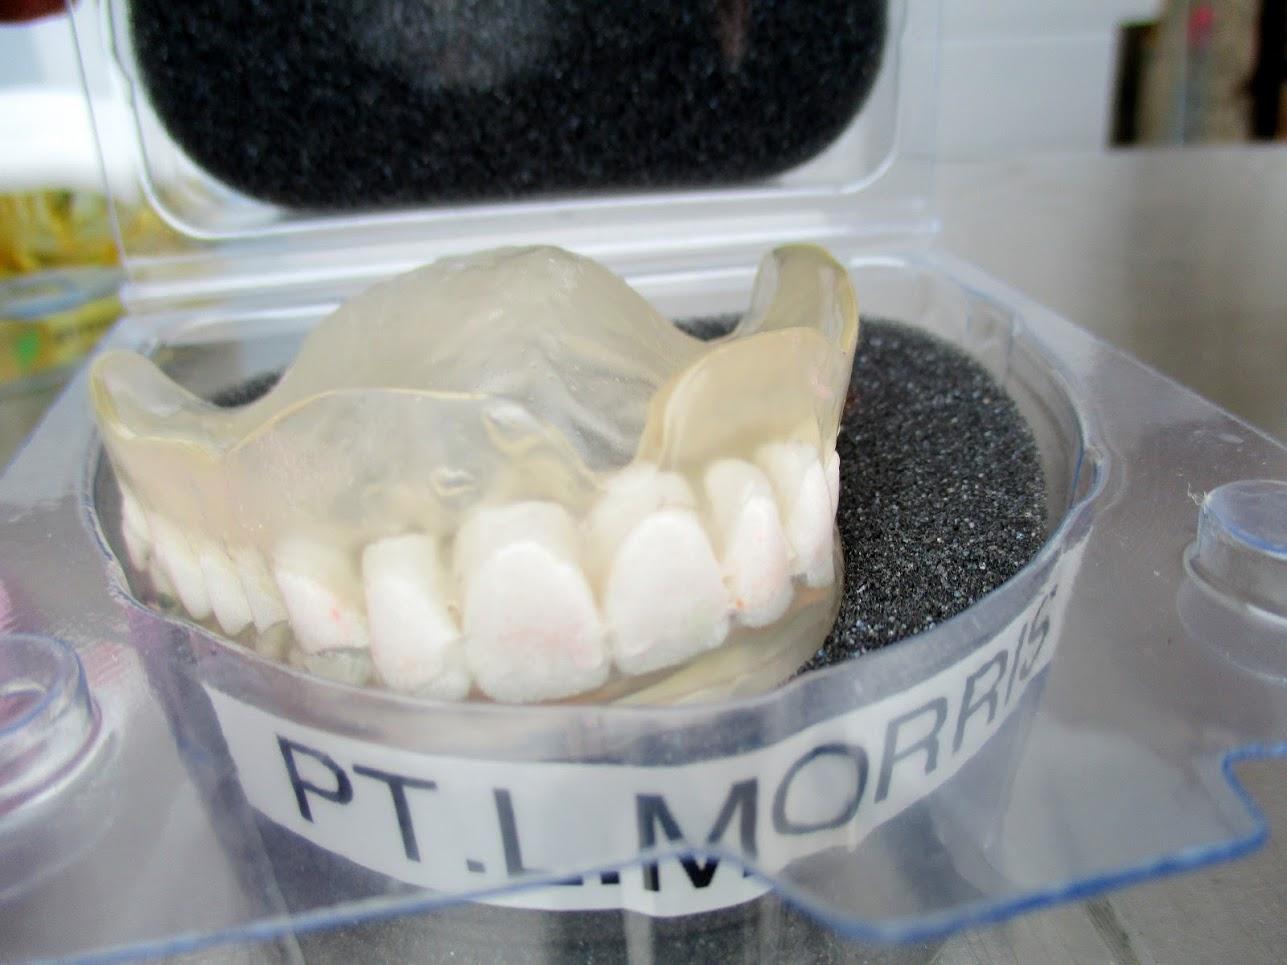 Lot 1 - Dental Models/Molds